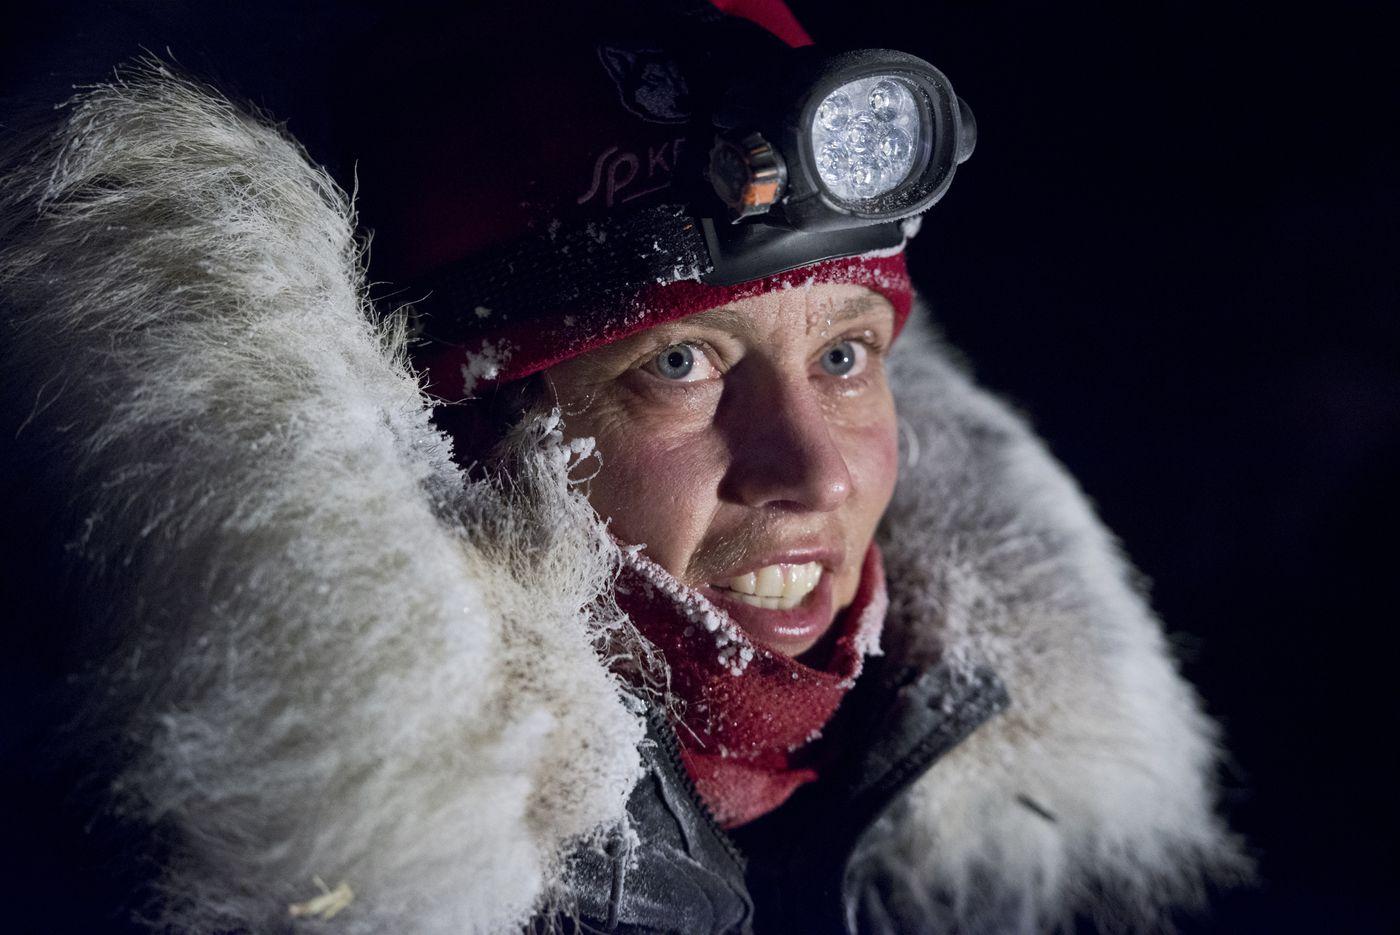 Aliy Zirkle arrives in Unalakleet. Brent Sass, Dallas Seavey and Aliy Zirkle were the first mushers to reach Unalakleet in the Iditarod Trail Sled Dog Race on Sunday, March 13, 2016.